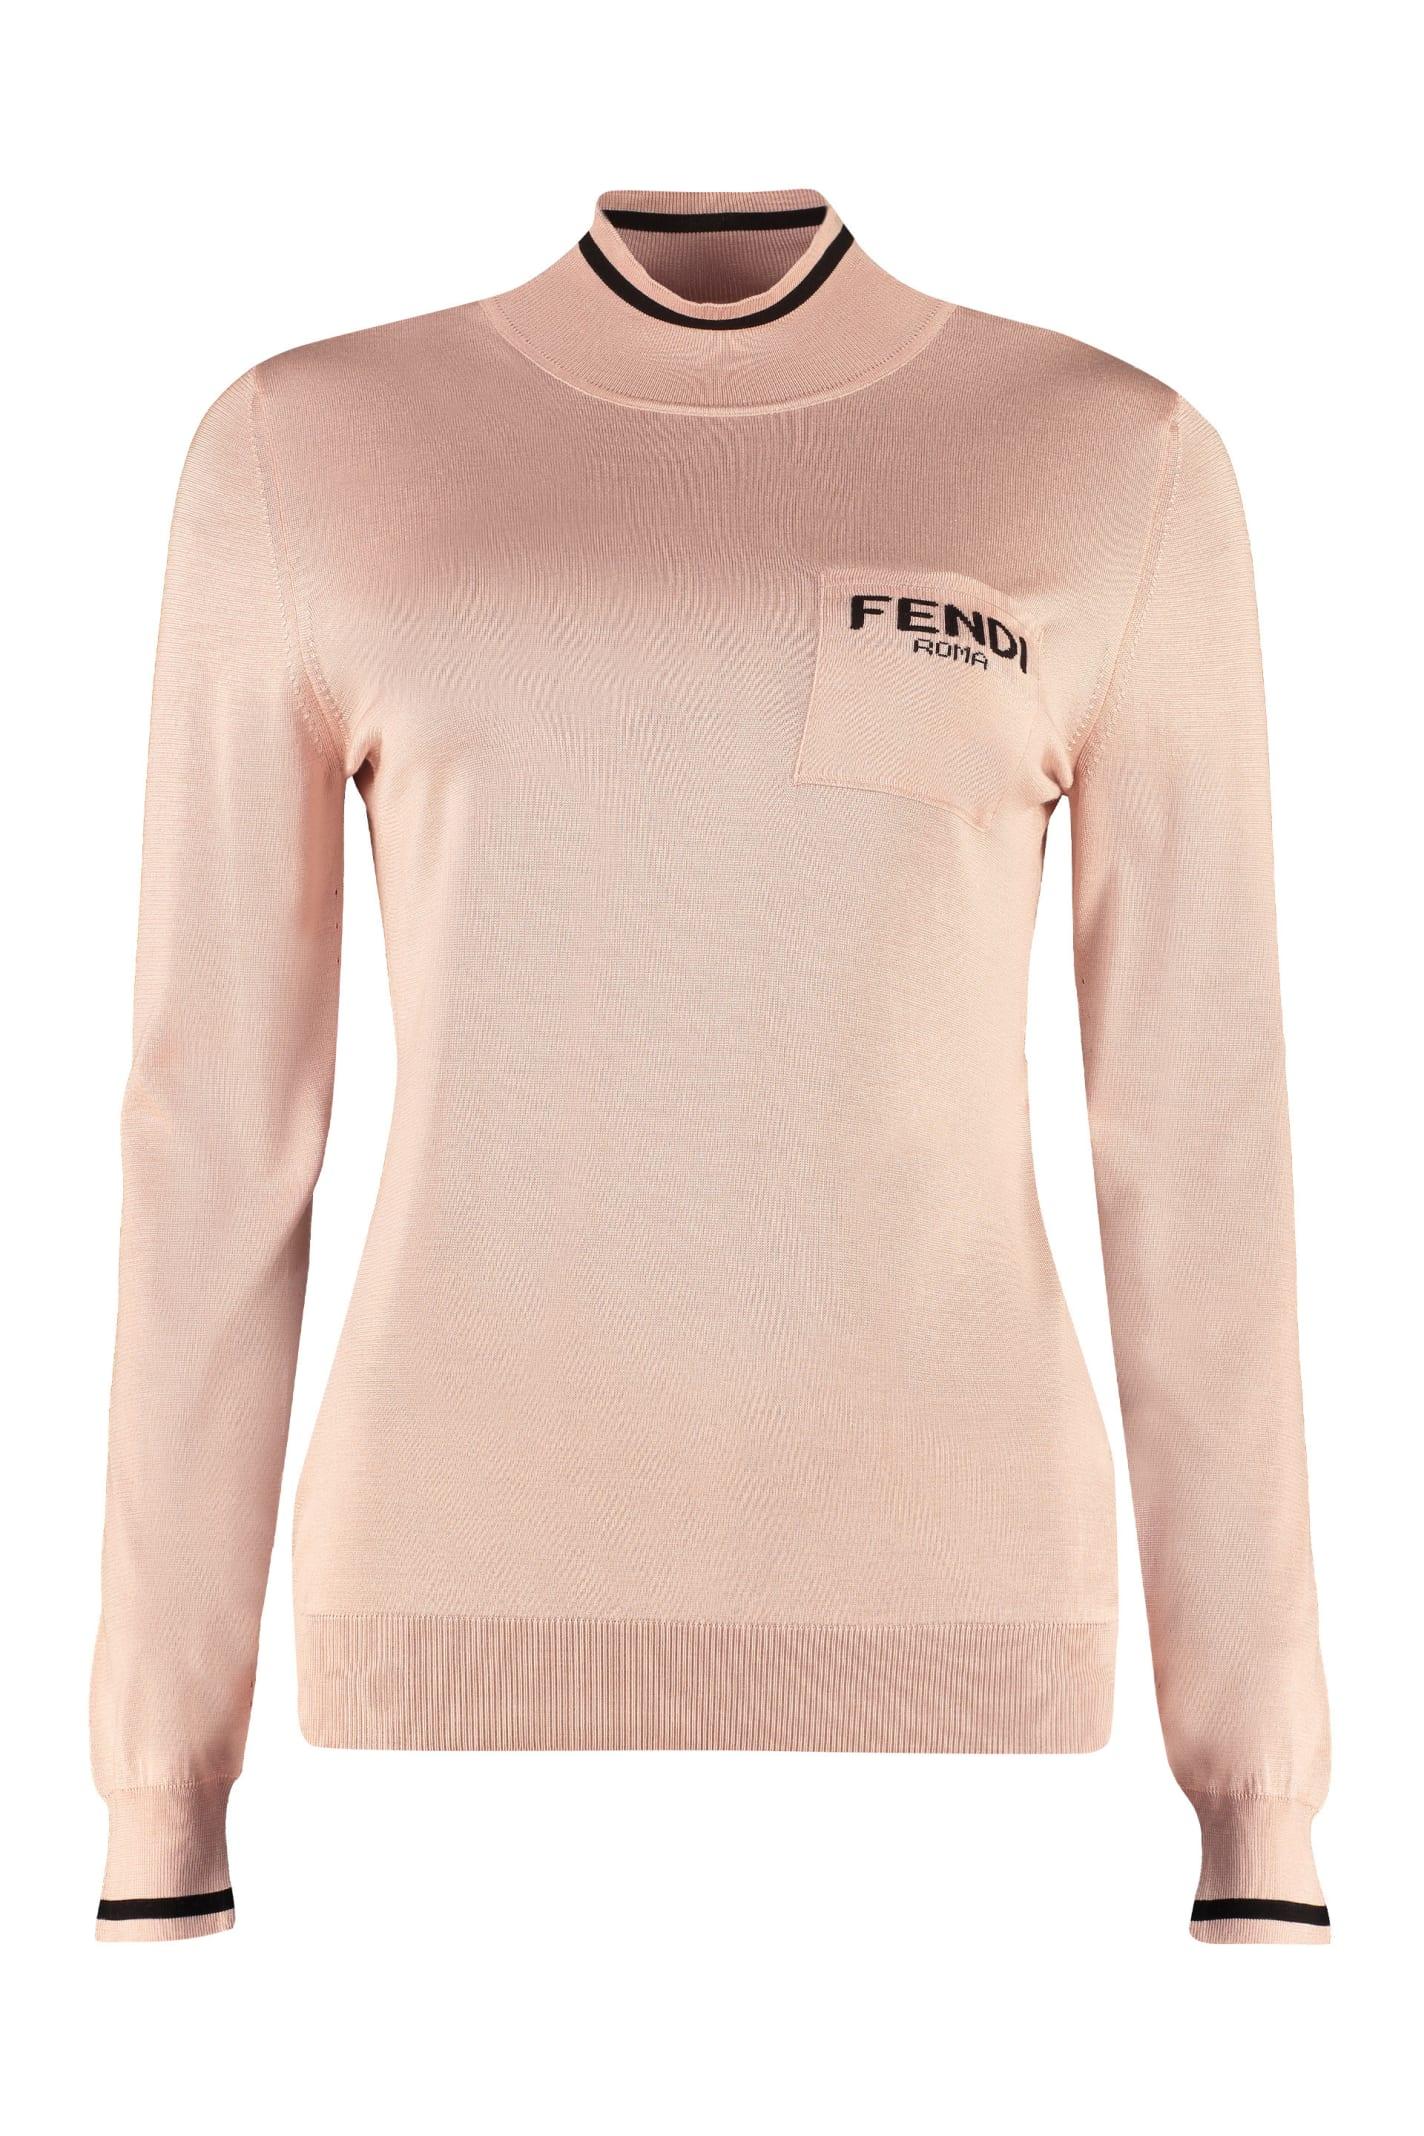 Fendi Long Sleeve Turtleneck In Pink